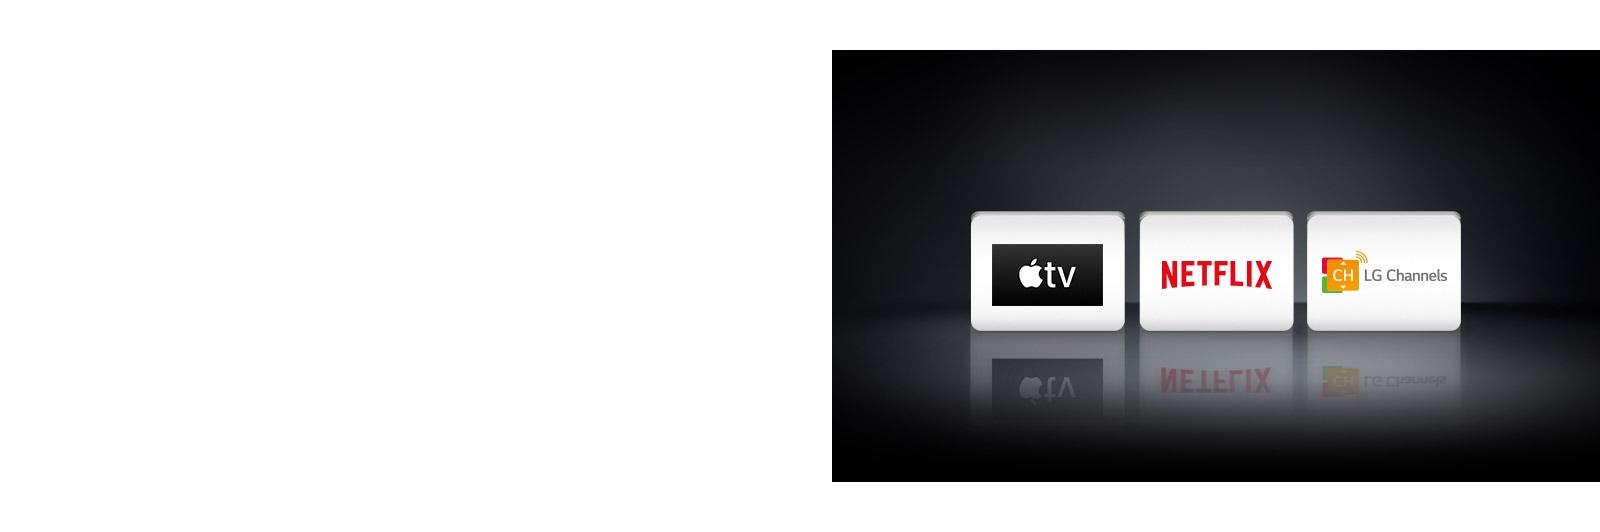 Tři loga: aplikace Apple TV, Netflix aLG Channels